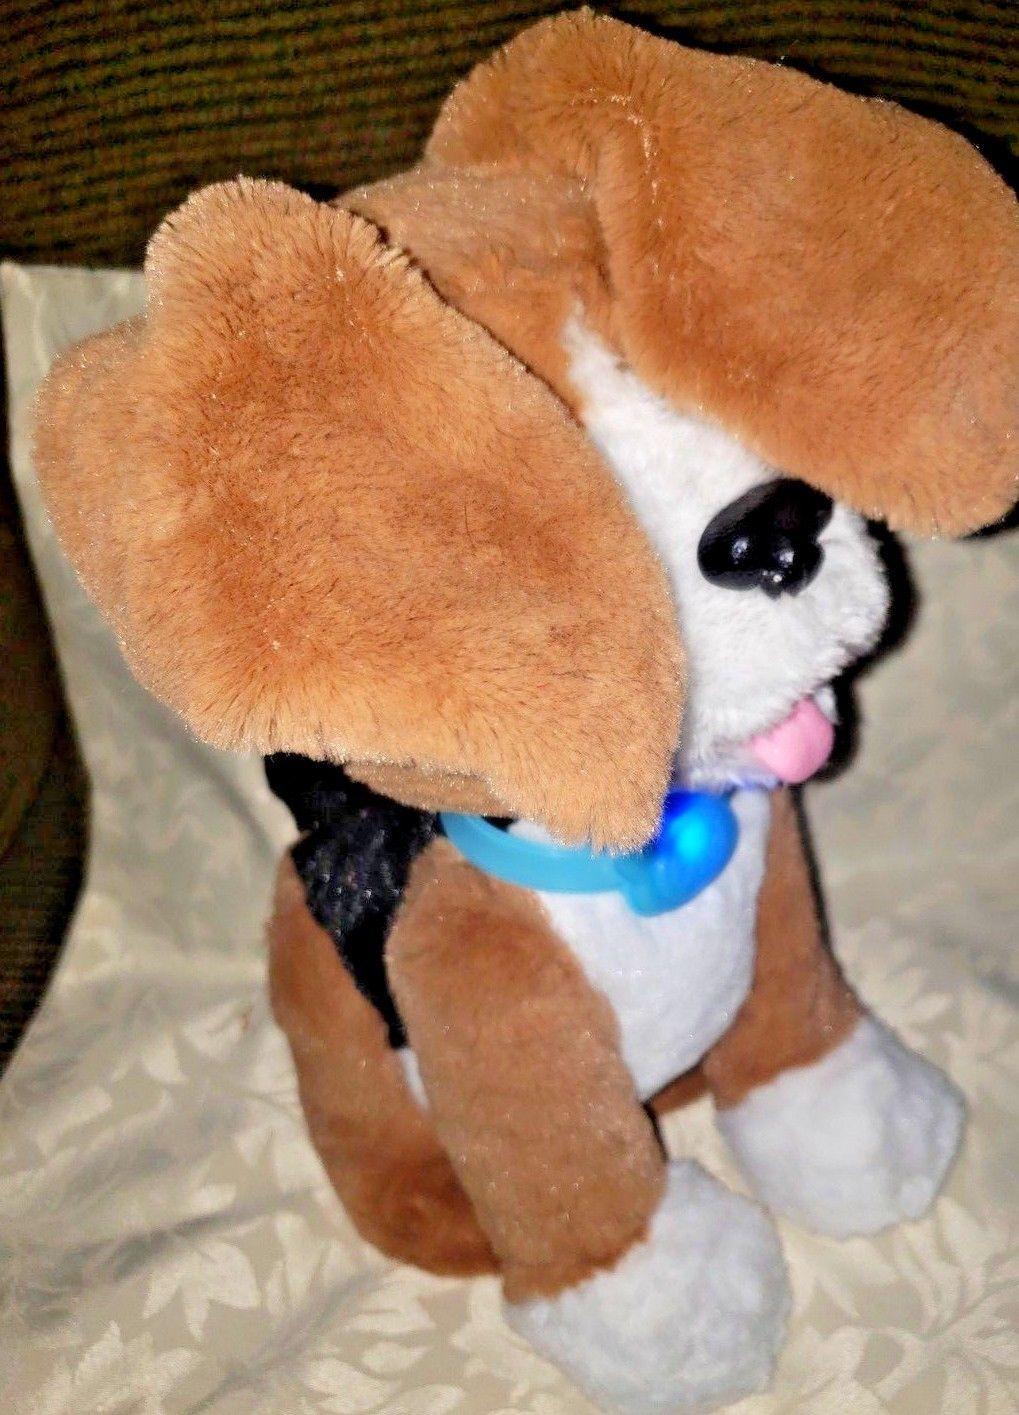 FurReal Friends Chatty Charlie The Barkin' Beagle Interactive Plush Dog Pet image 5